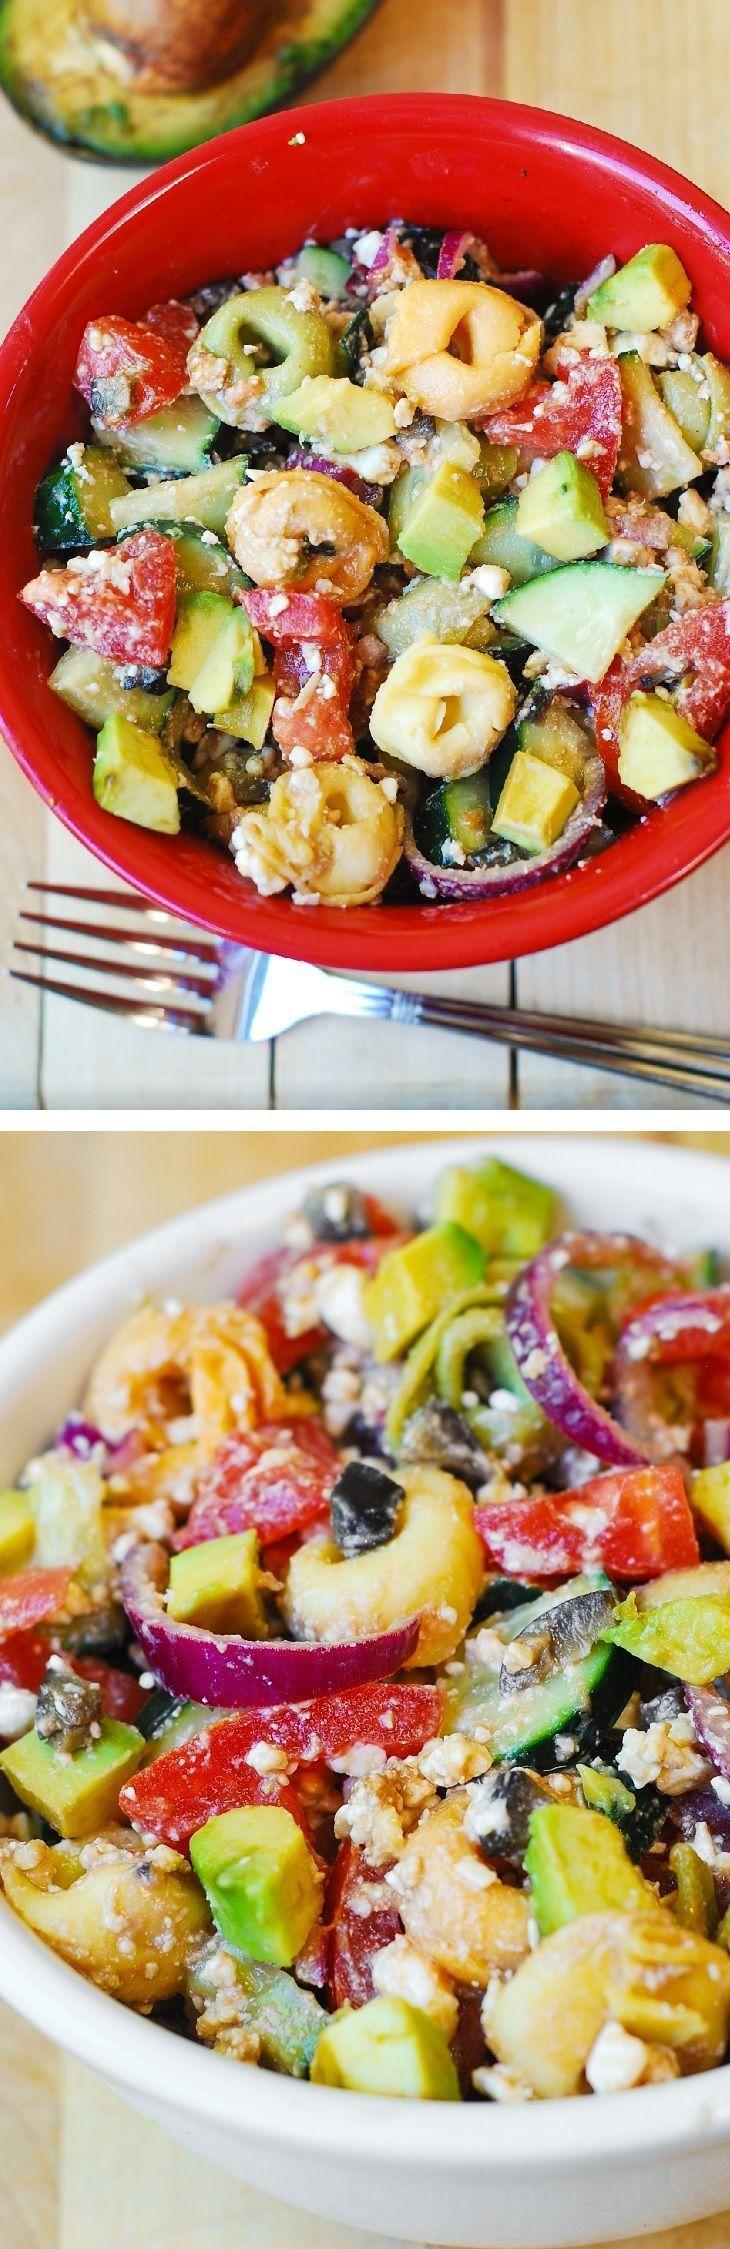 Greek Tortellini Salad with Tomatoes, Avocados, Cucumbers | Mediterranean salad, appetizer, gluten free recipe